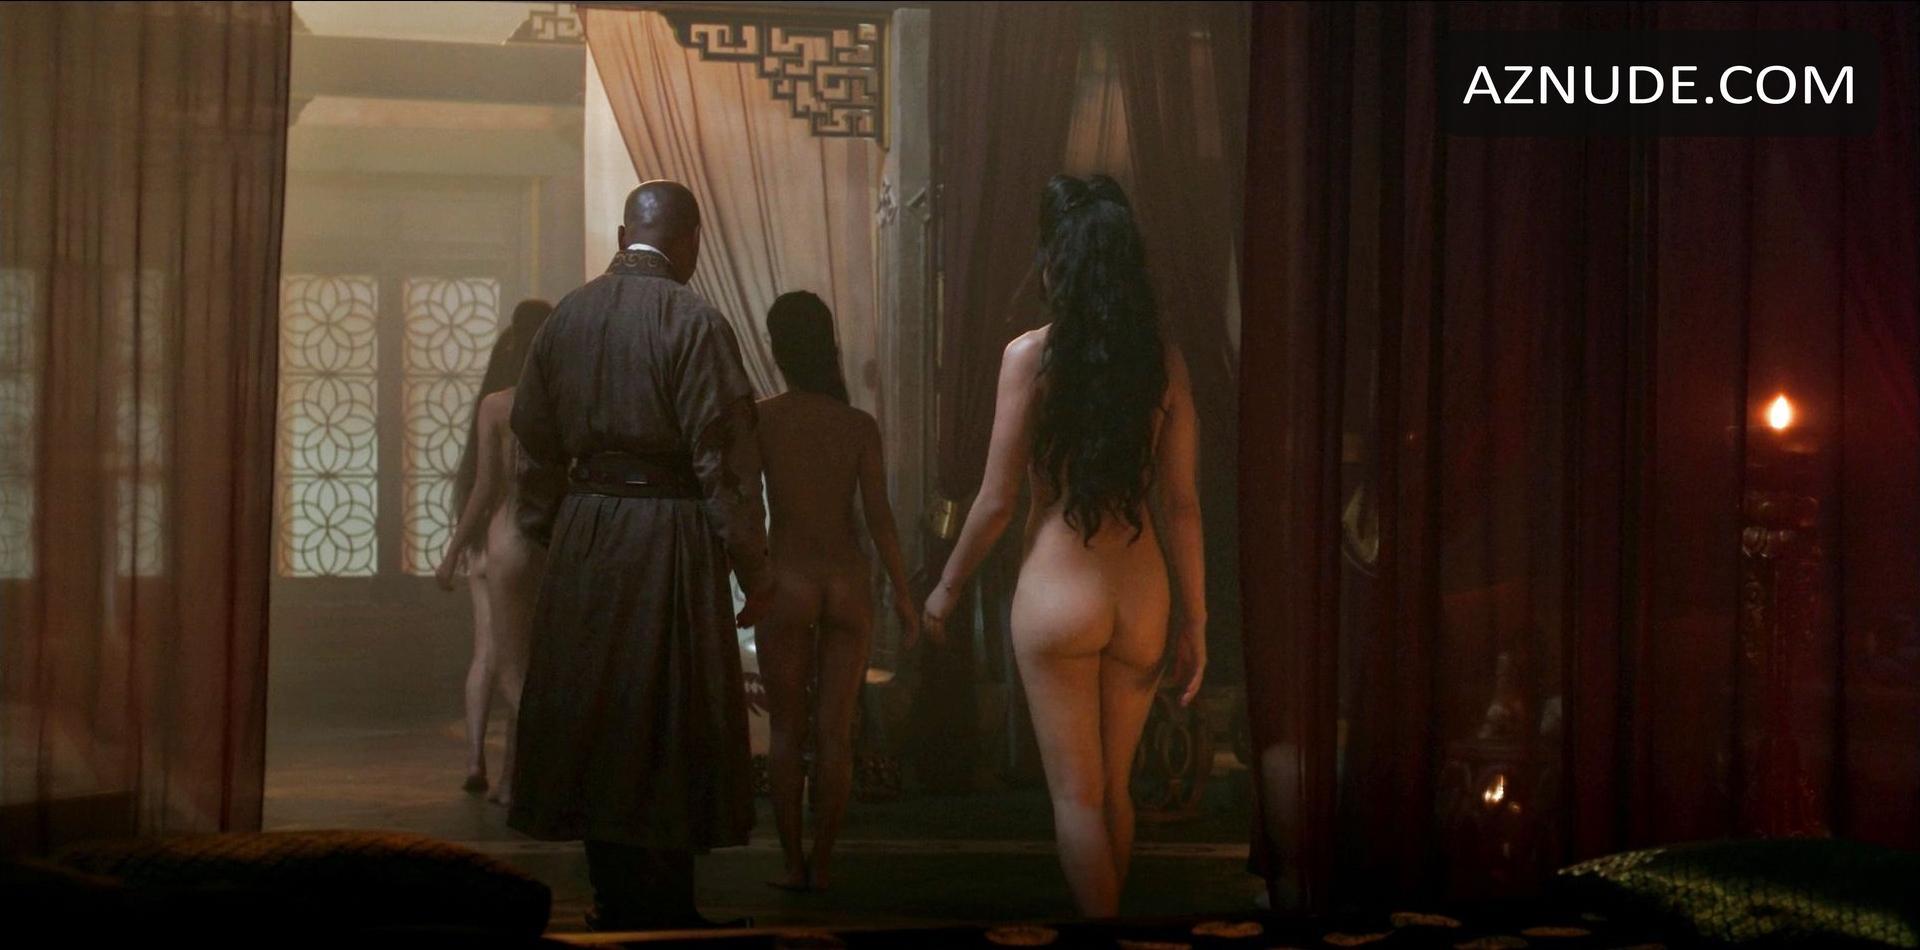 Olivia cheng nude marco polo s01e034 - 2 5